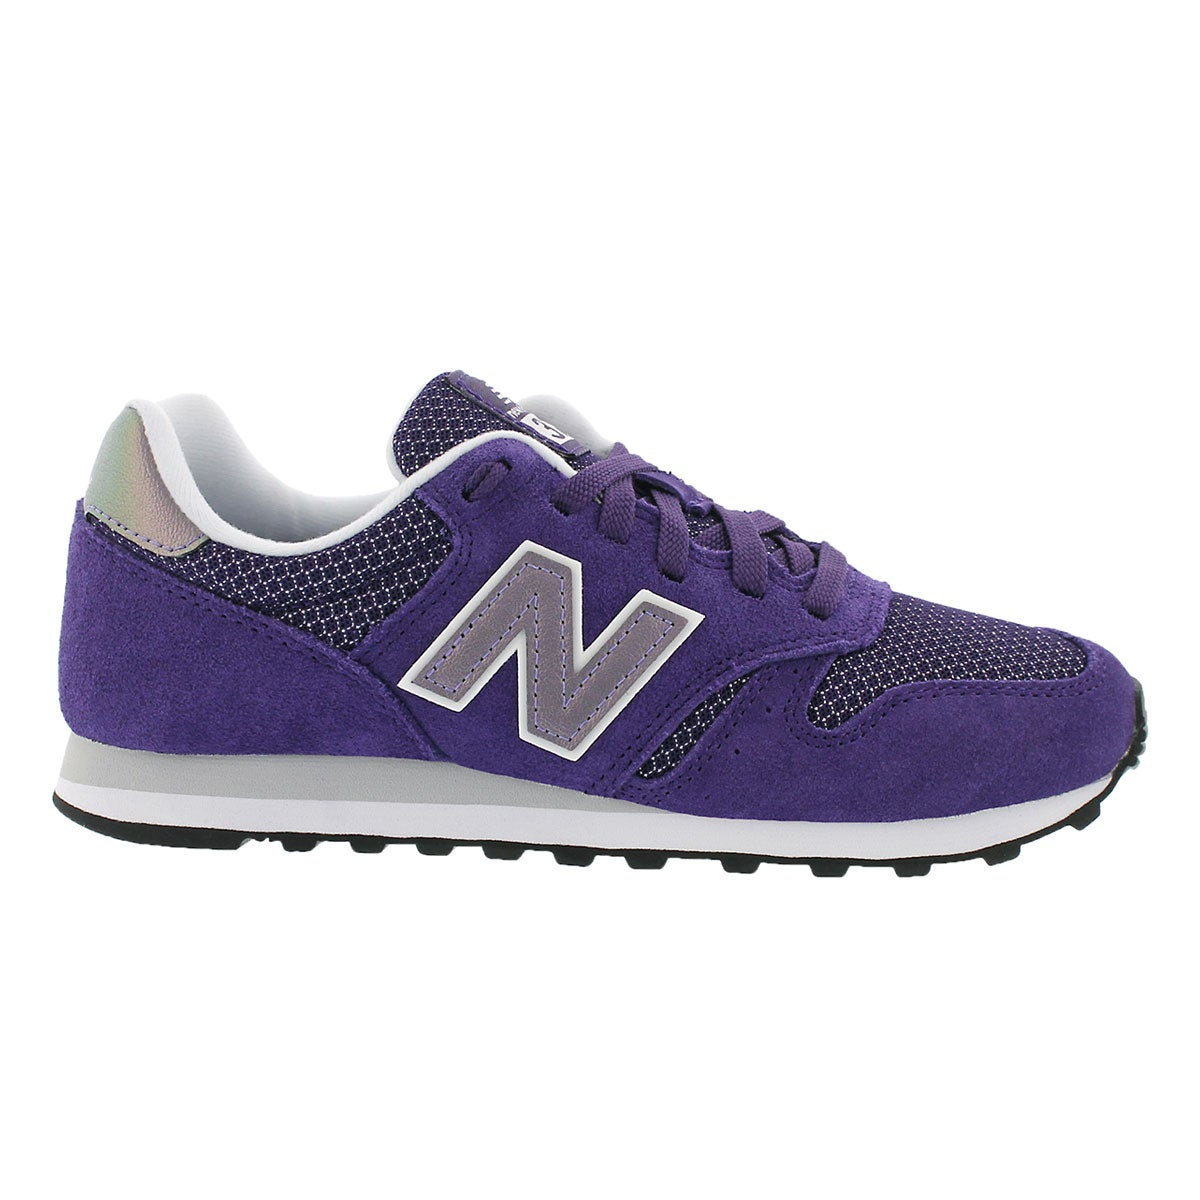 Lds 373 purple lace up running shoe